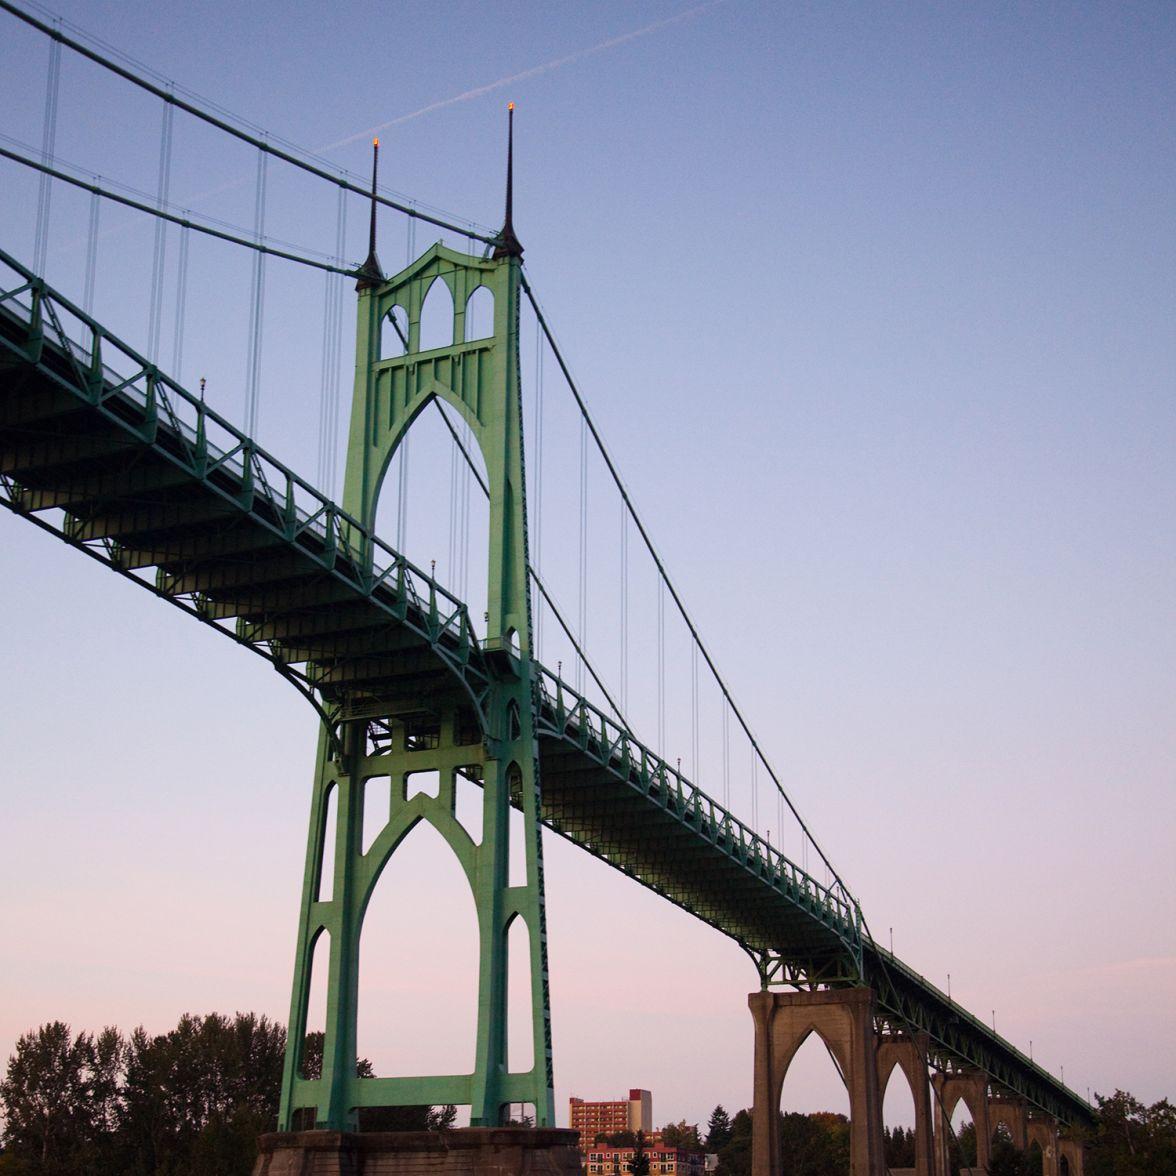 The St. John's Bridge as seen from a ship on the Willamette River in Portland, Oregon